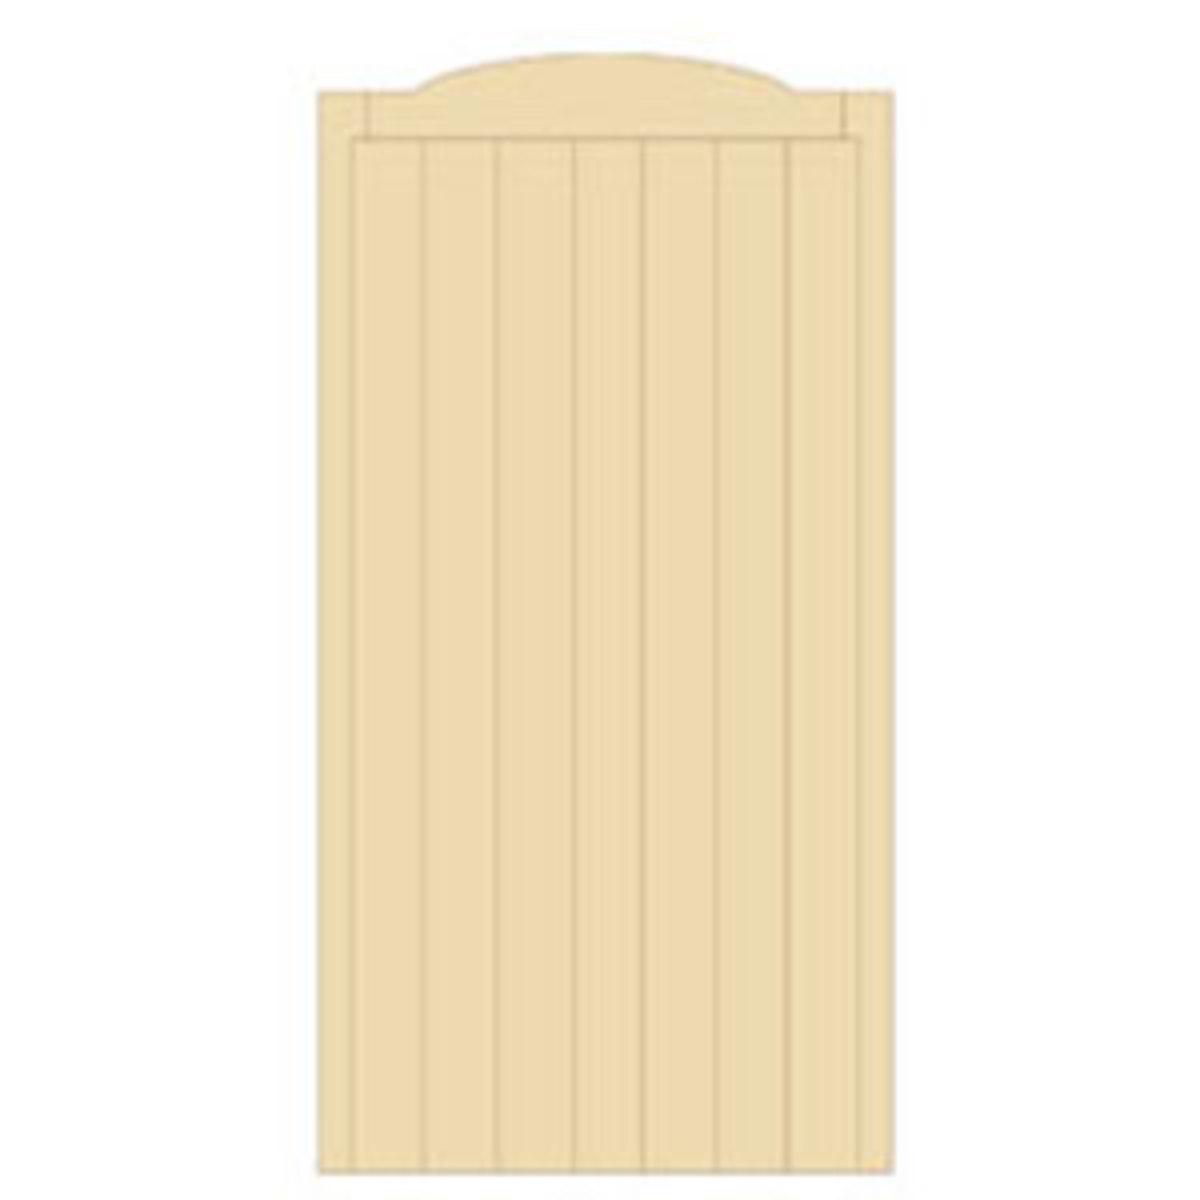 Wooden gates - Tall single side entrance wooden gates - Cherbourne gate